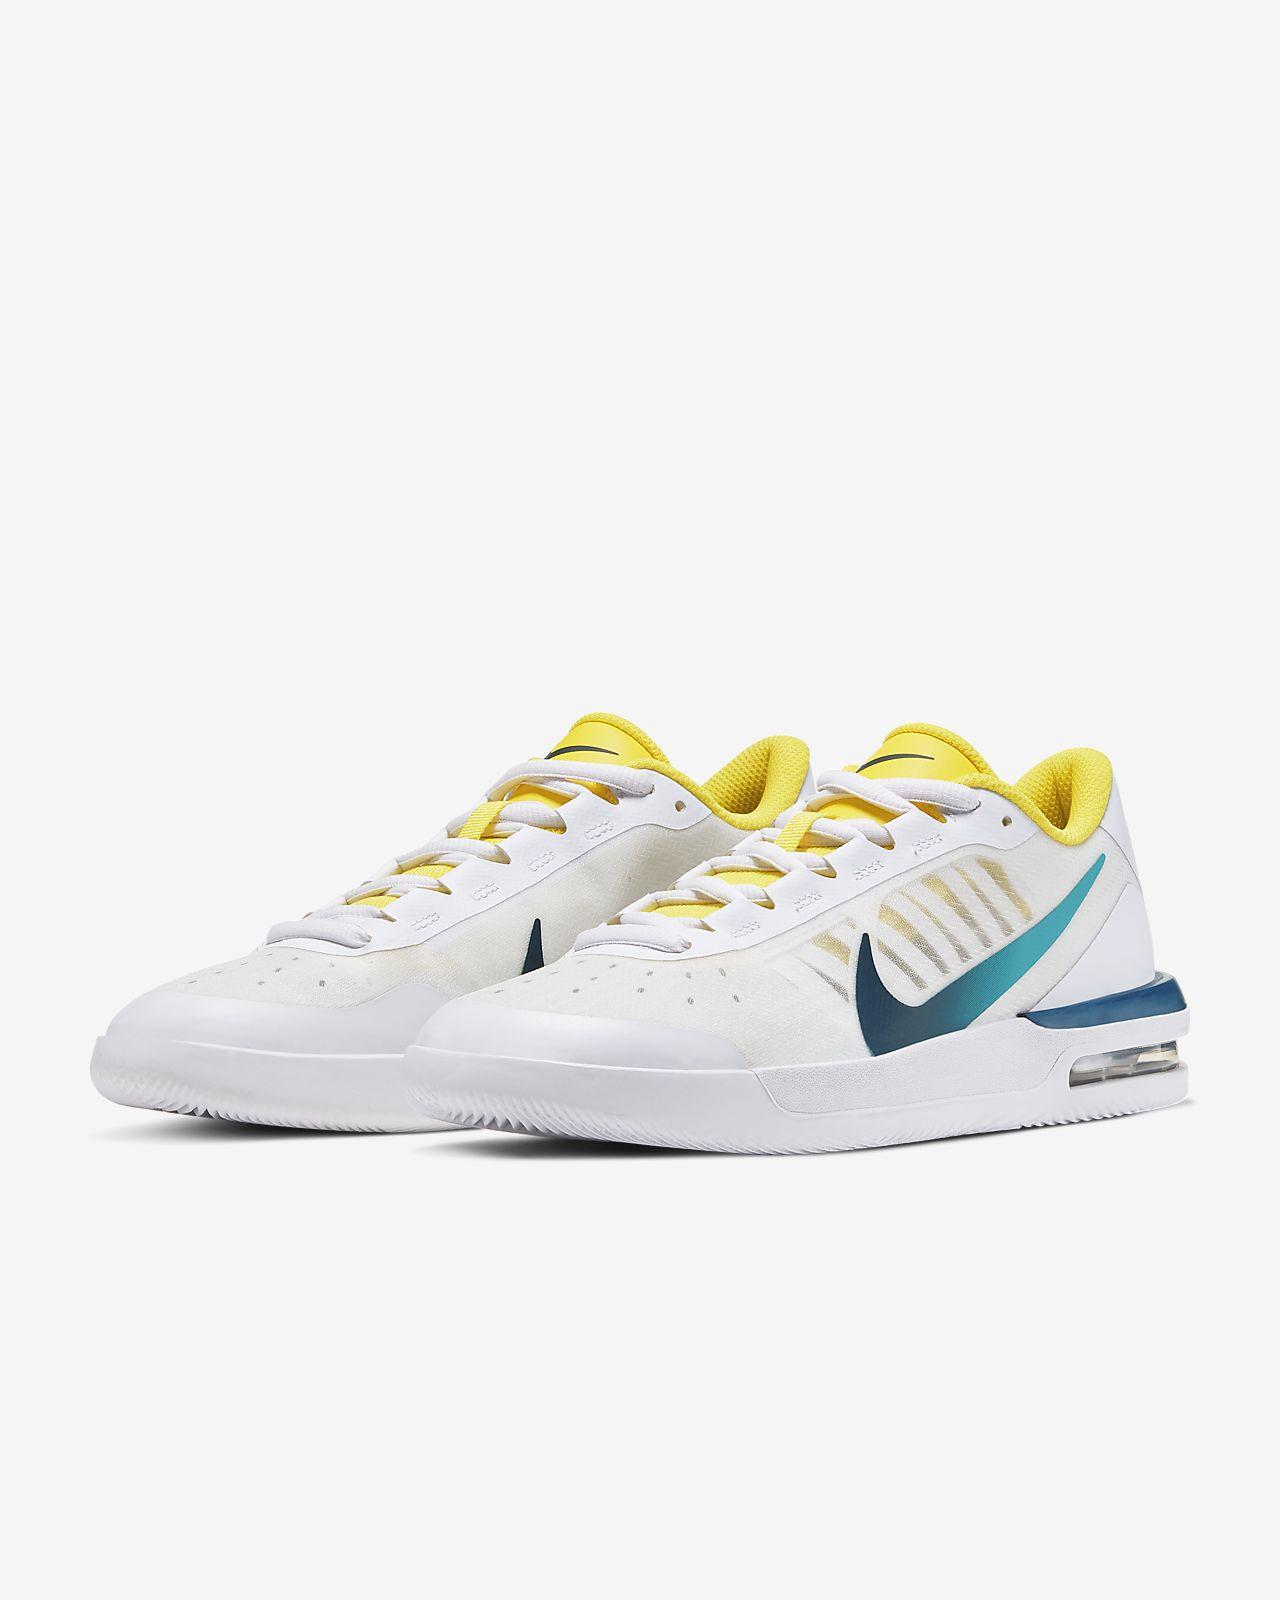 Męskie buty tenisowe Nike Air Max Vapor Wing MS white